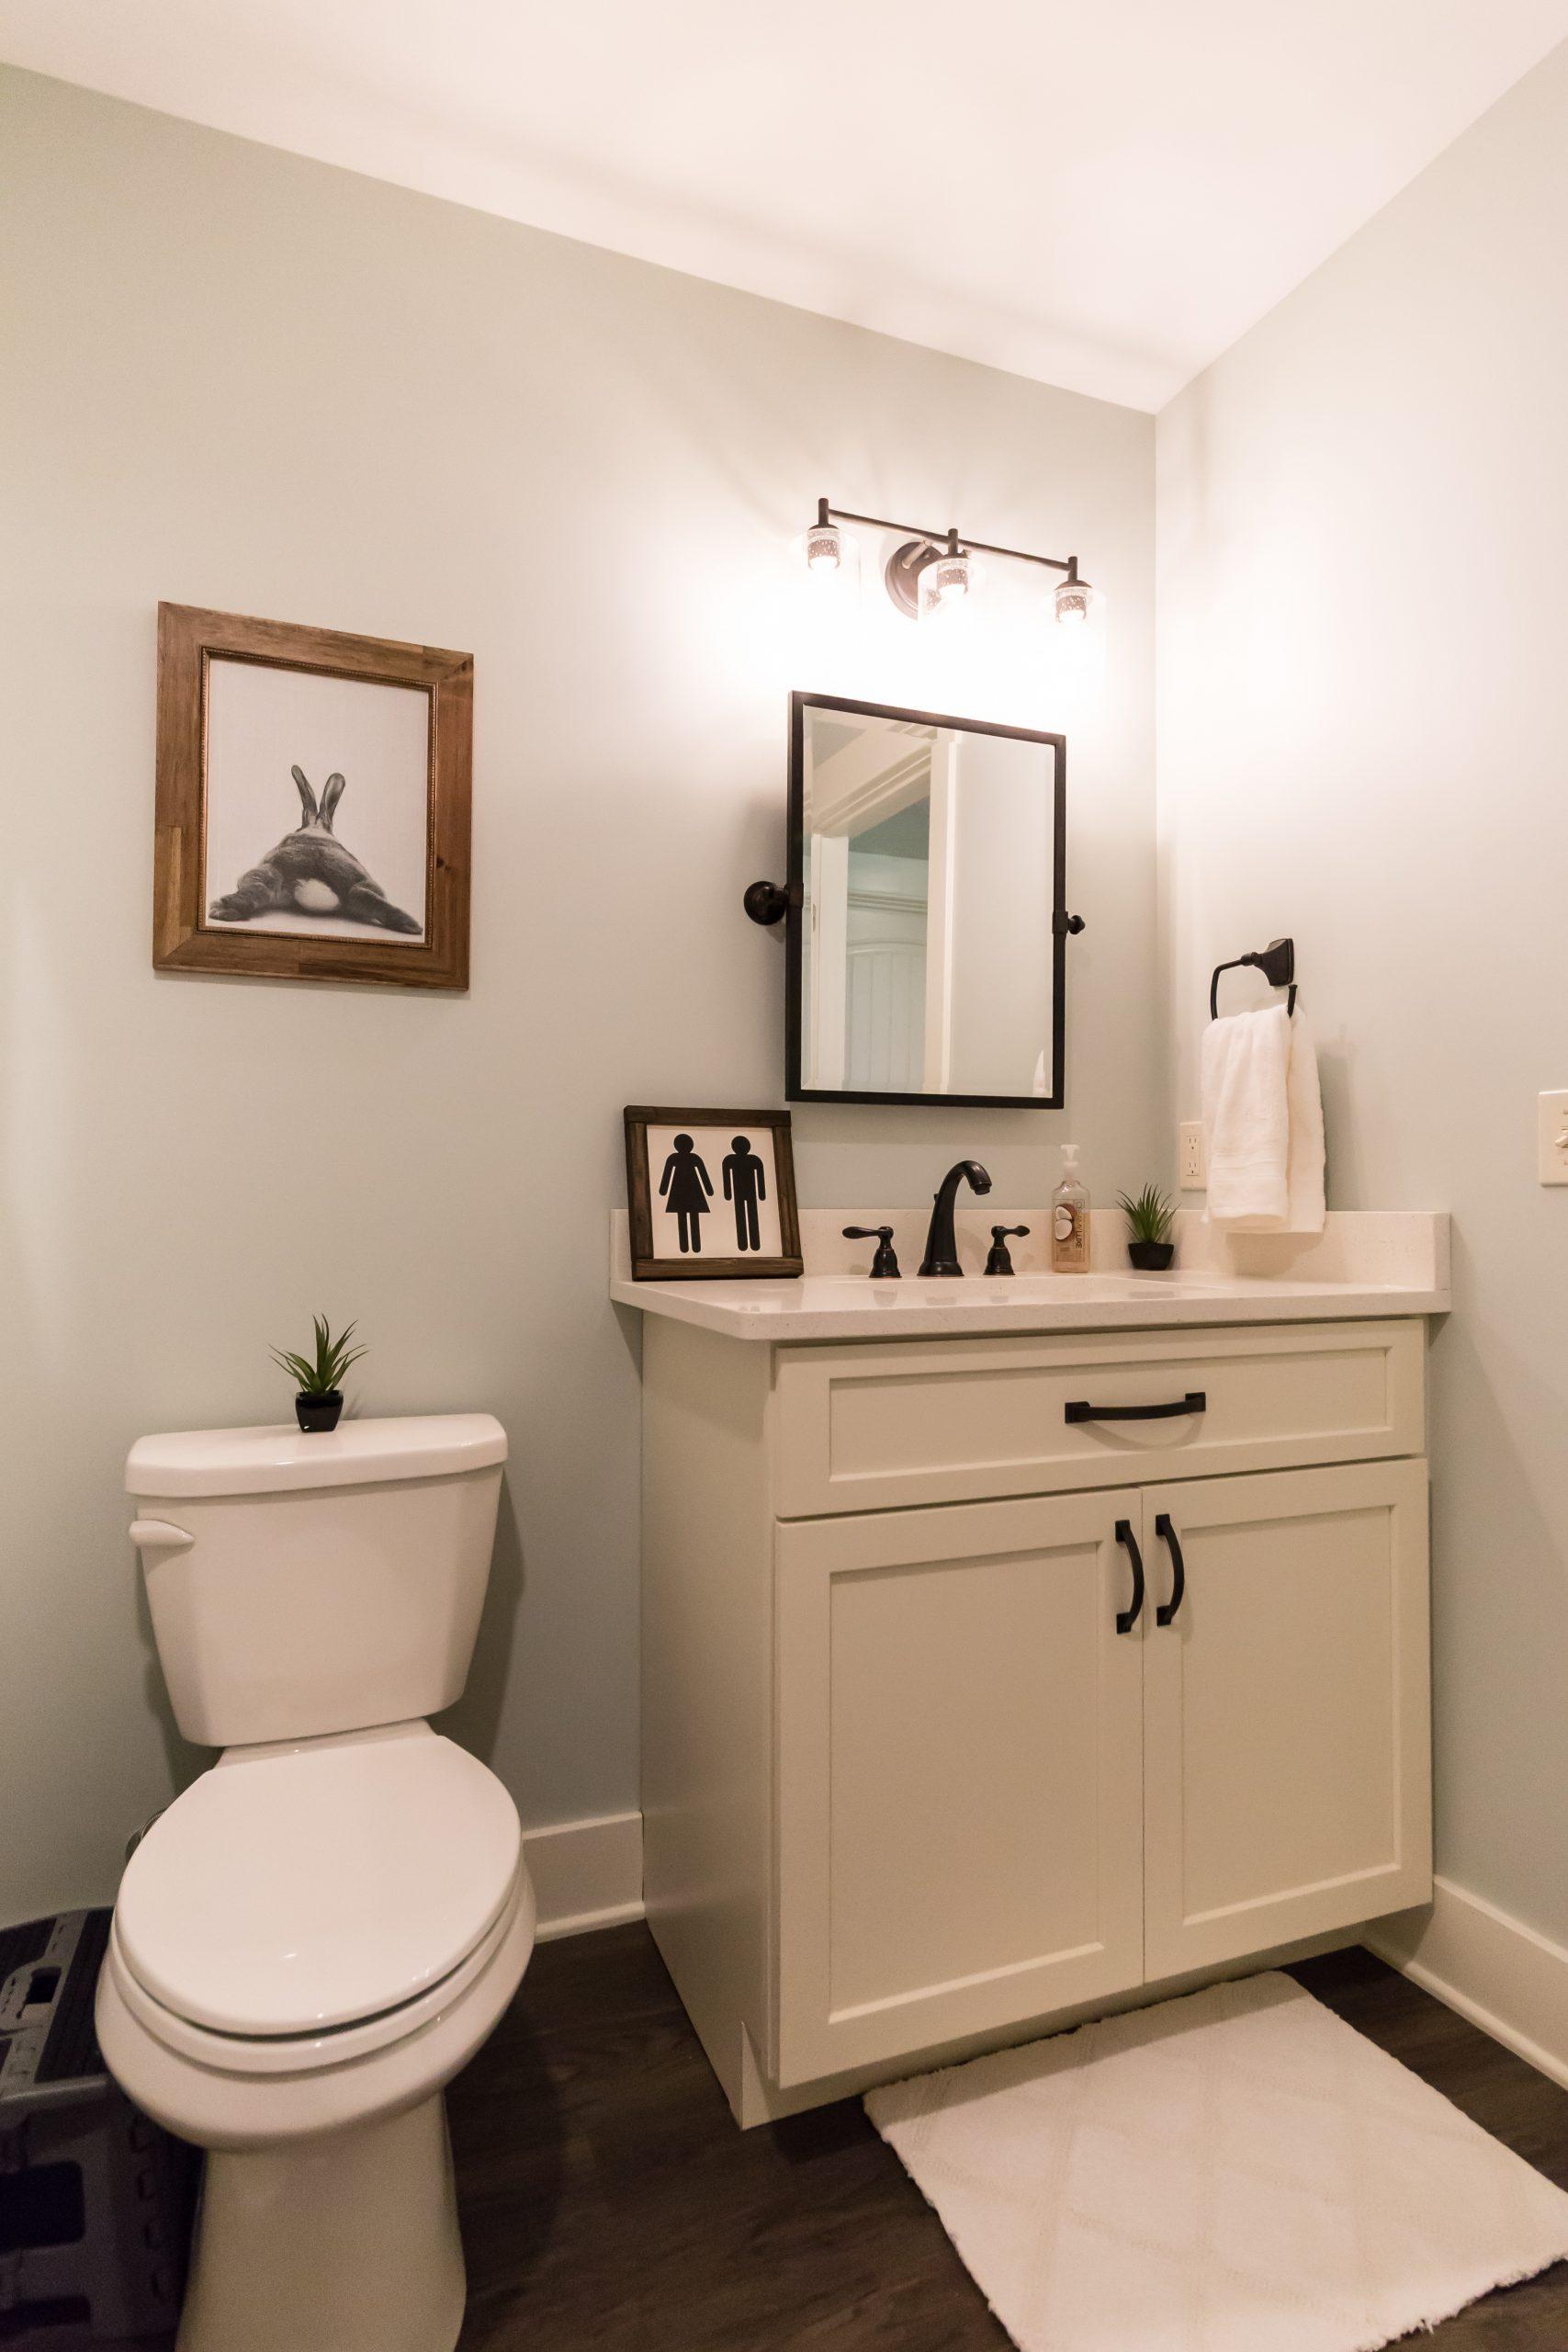 Toilet and Custom Cabinets in Custom Bathroom Remodel in West Michigan